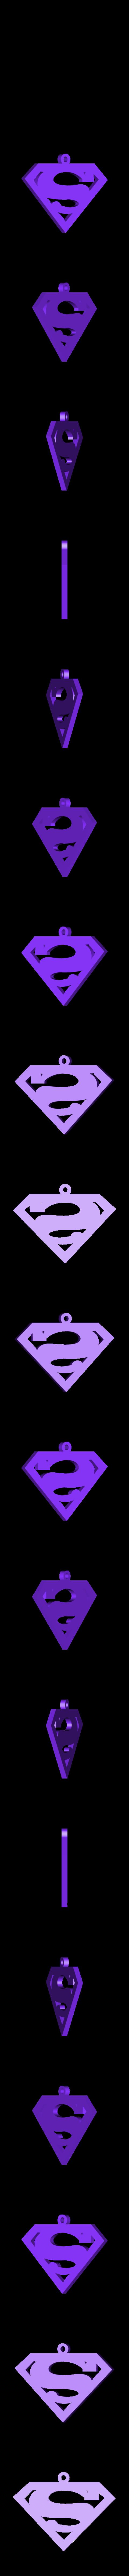 superman.stl Download free STL file superman pendant • 3D printable template, fcosaldana0210